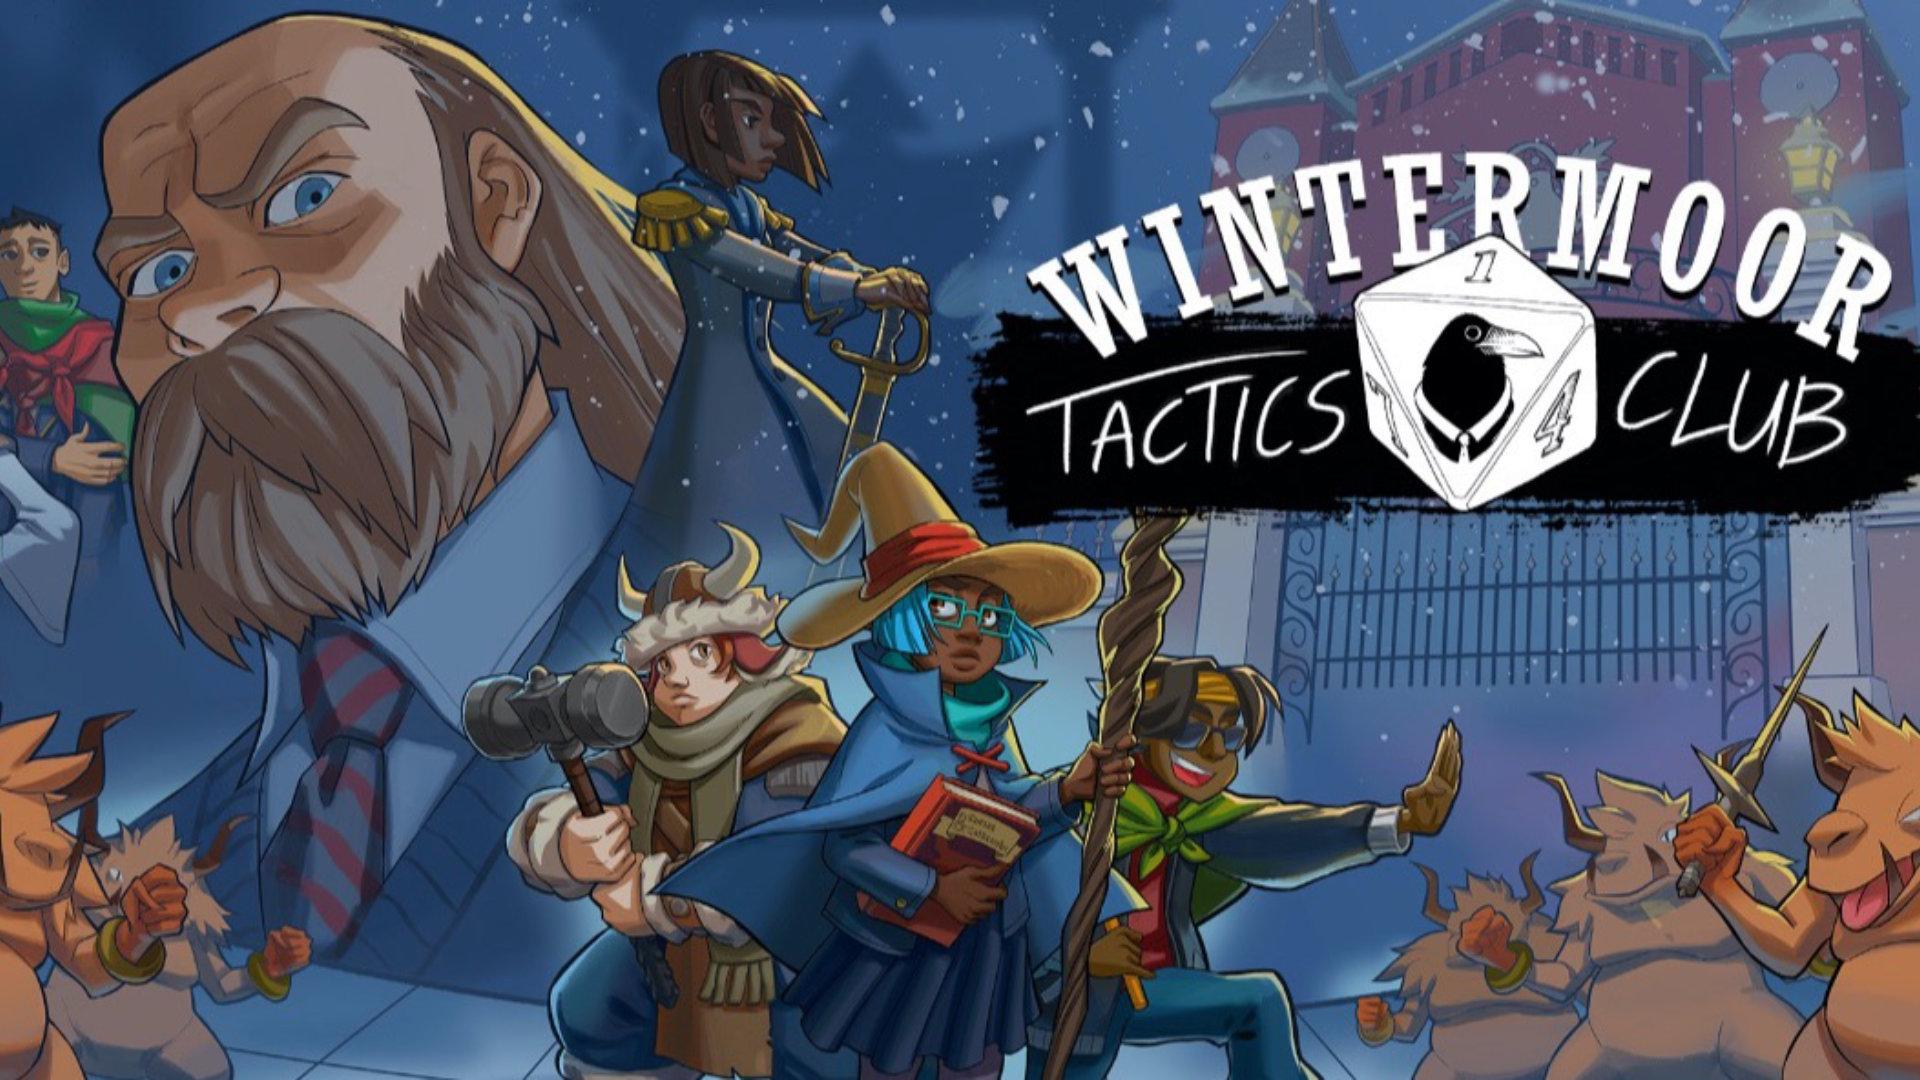 Wintermoor Tactics Club - Featured Image